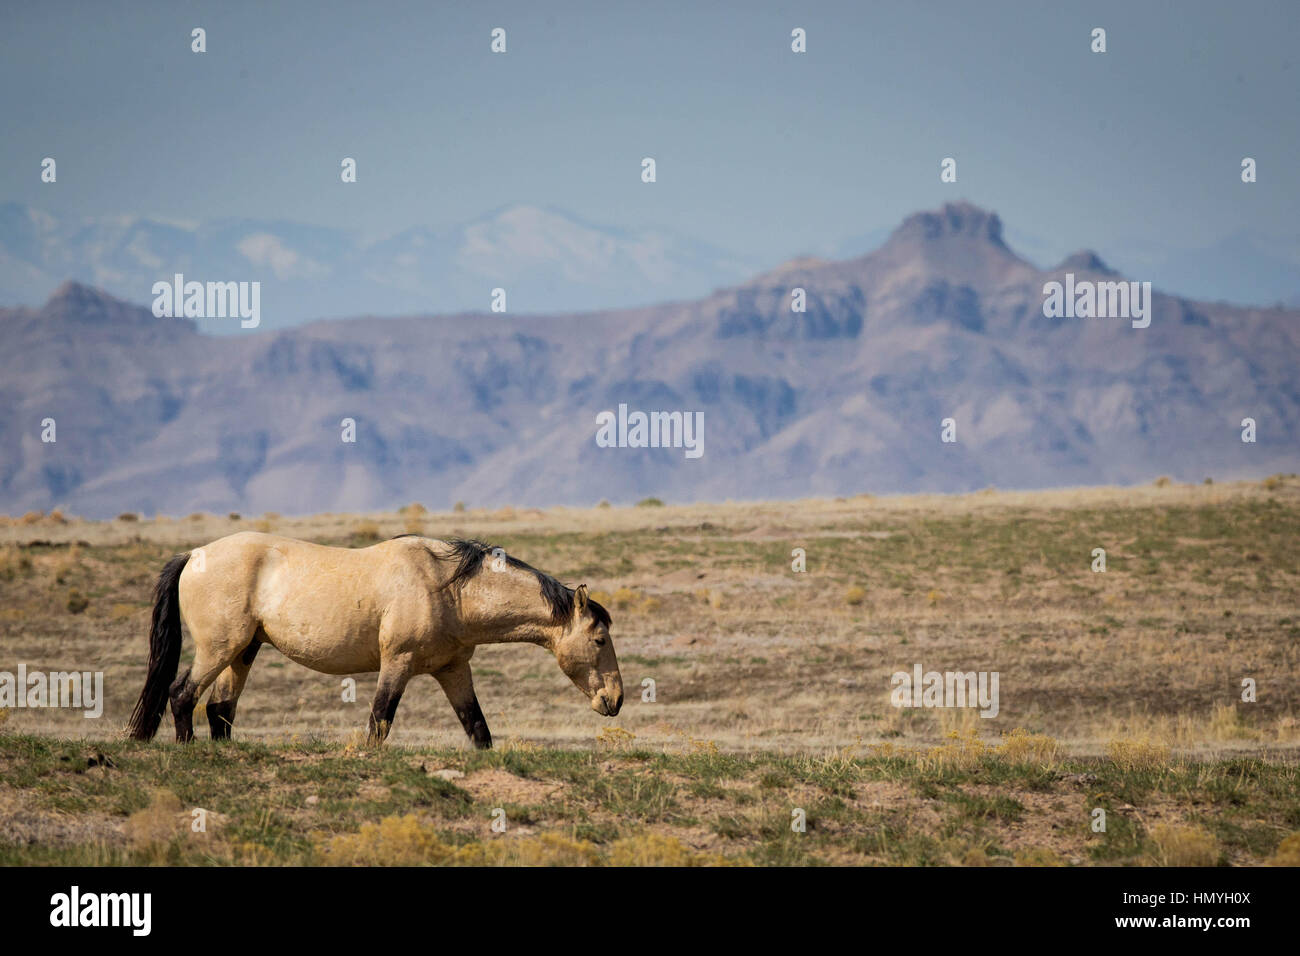 Stock Kiger Mustang Wild Horse (Equus ferus caballus) in West Desert of Northern Utah, USA, North America - Stock Image